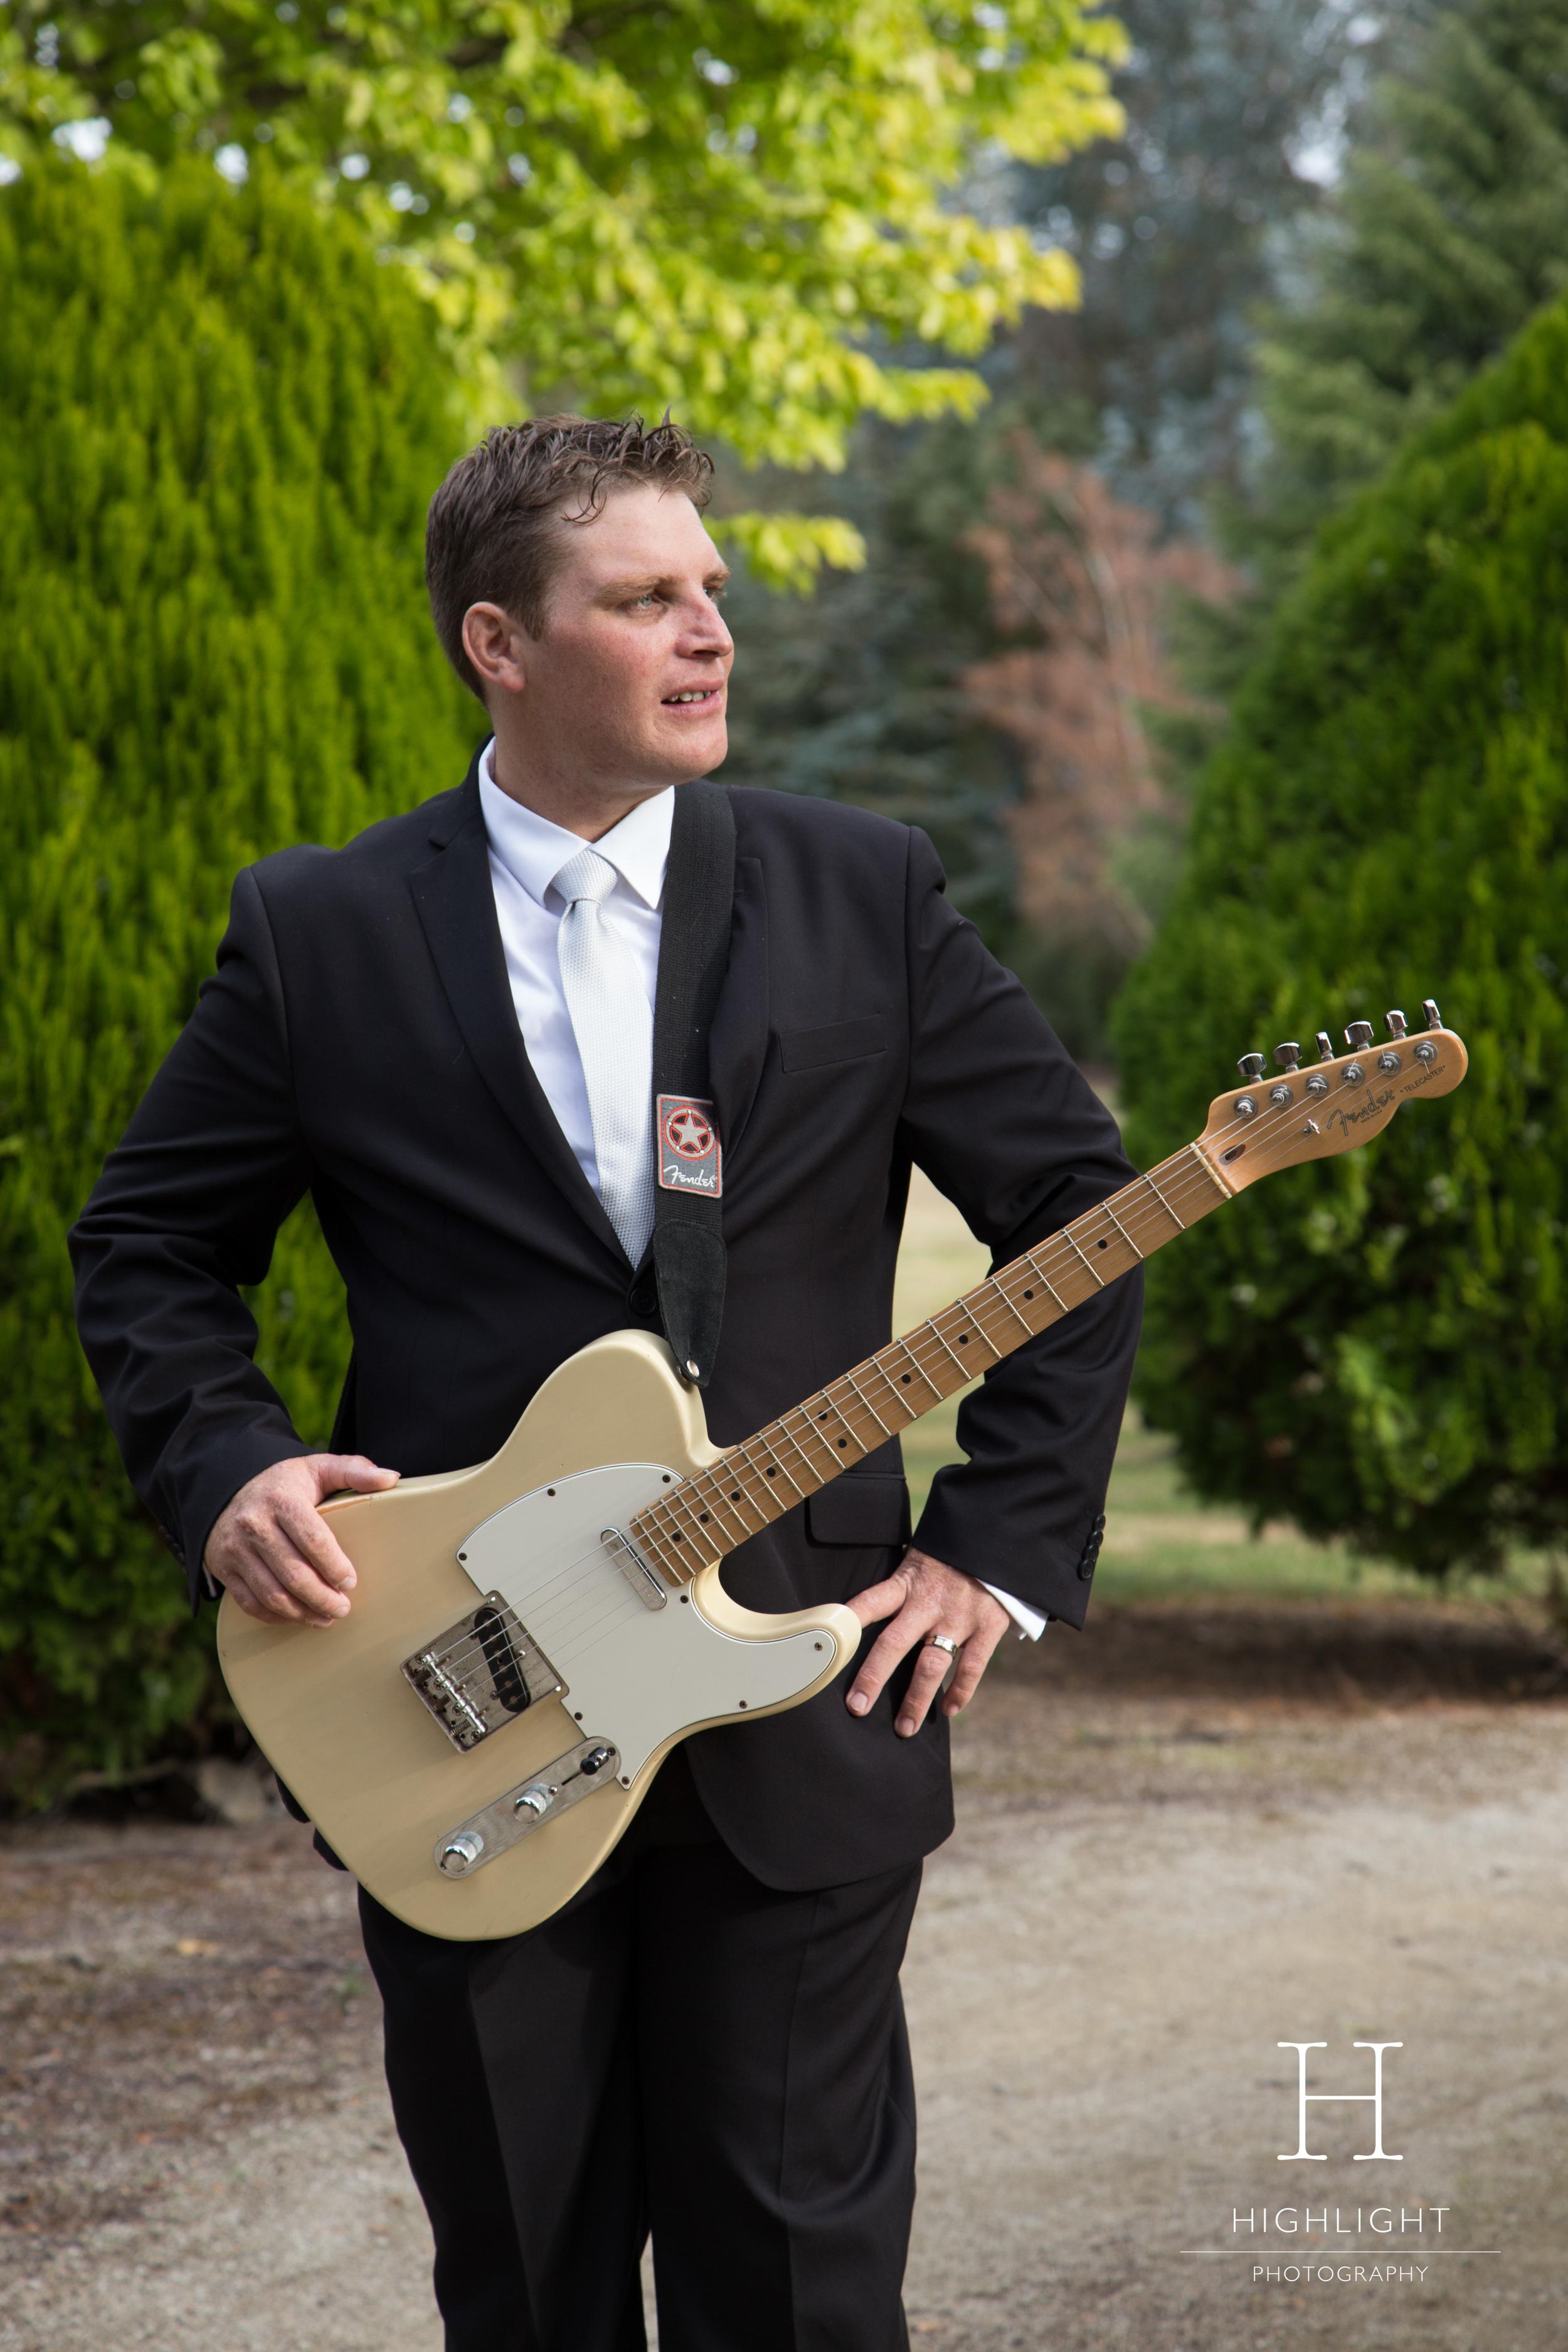 highlight_photography_wedding_new_zealand_guitar.jpg